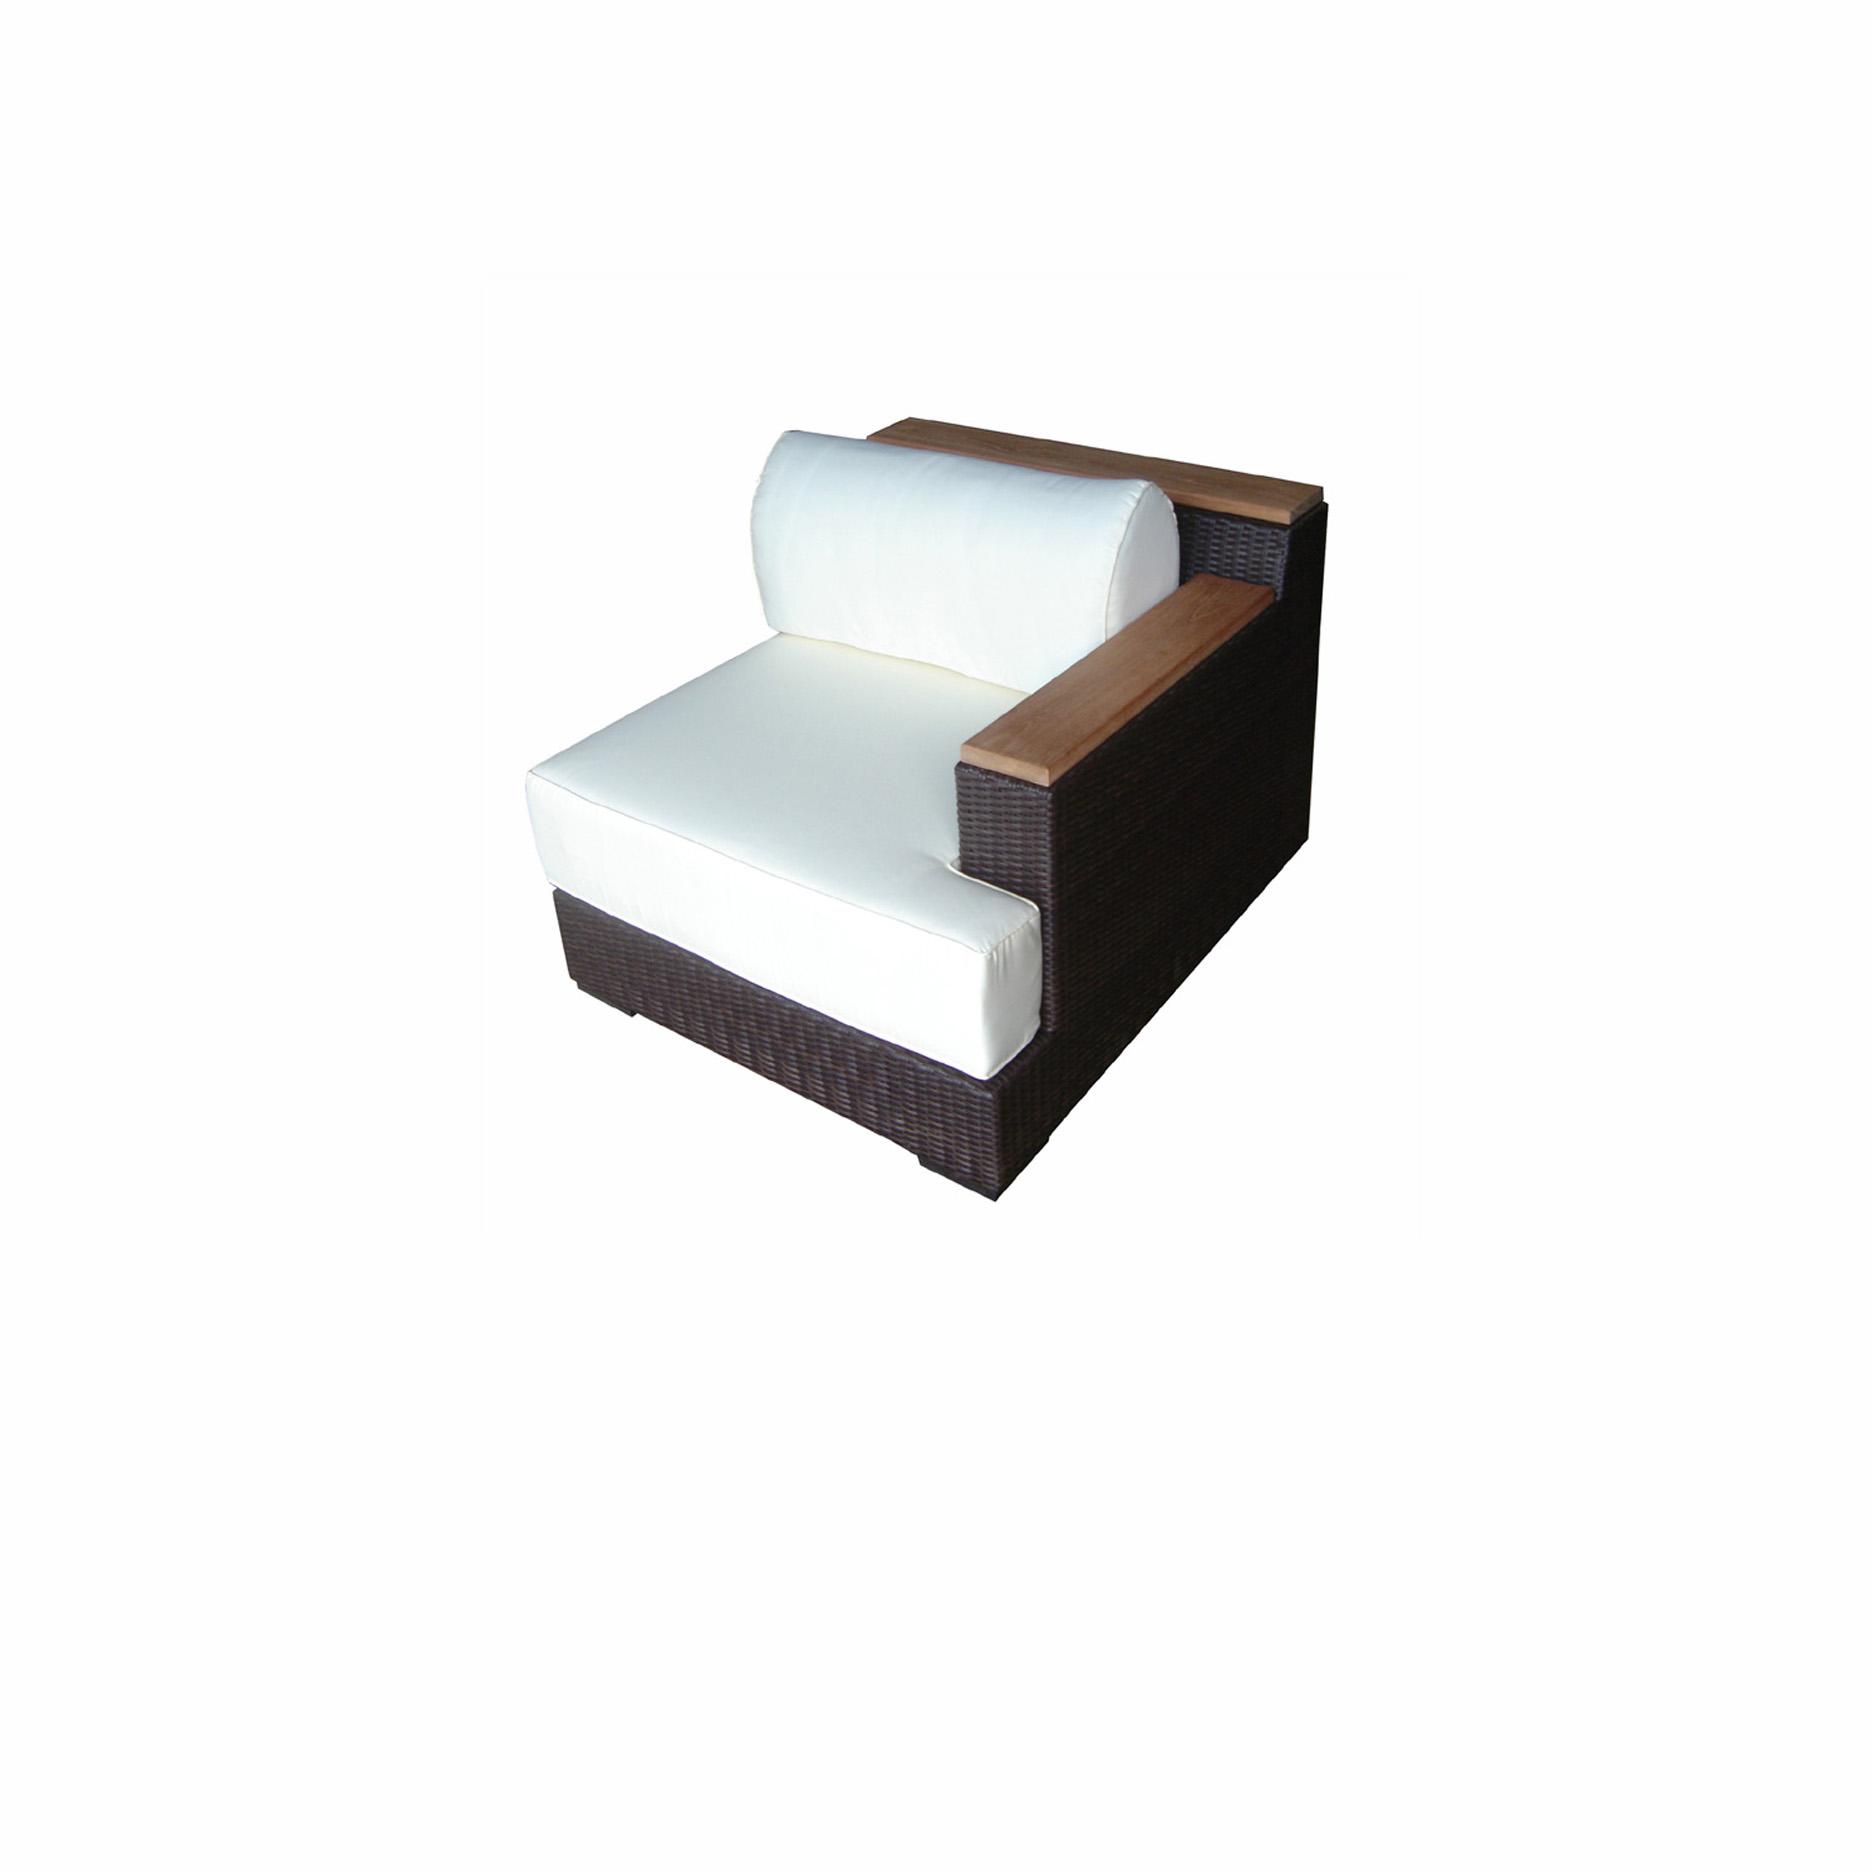 Synth. Rattan Chair Corner Modular   Asia Concept   High ...